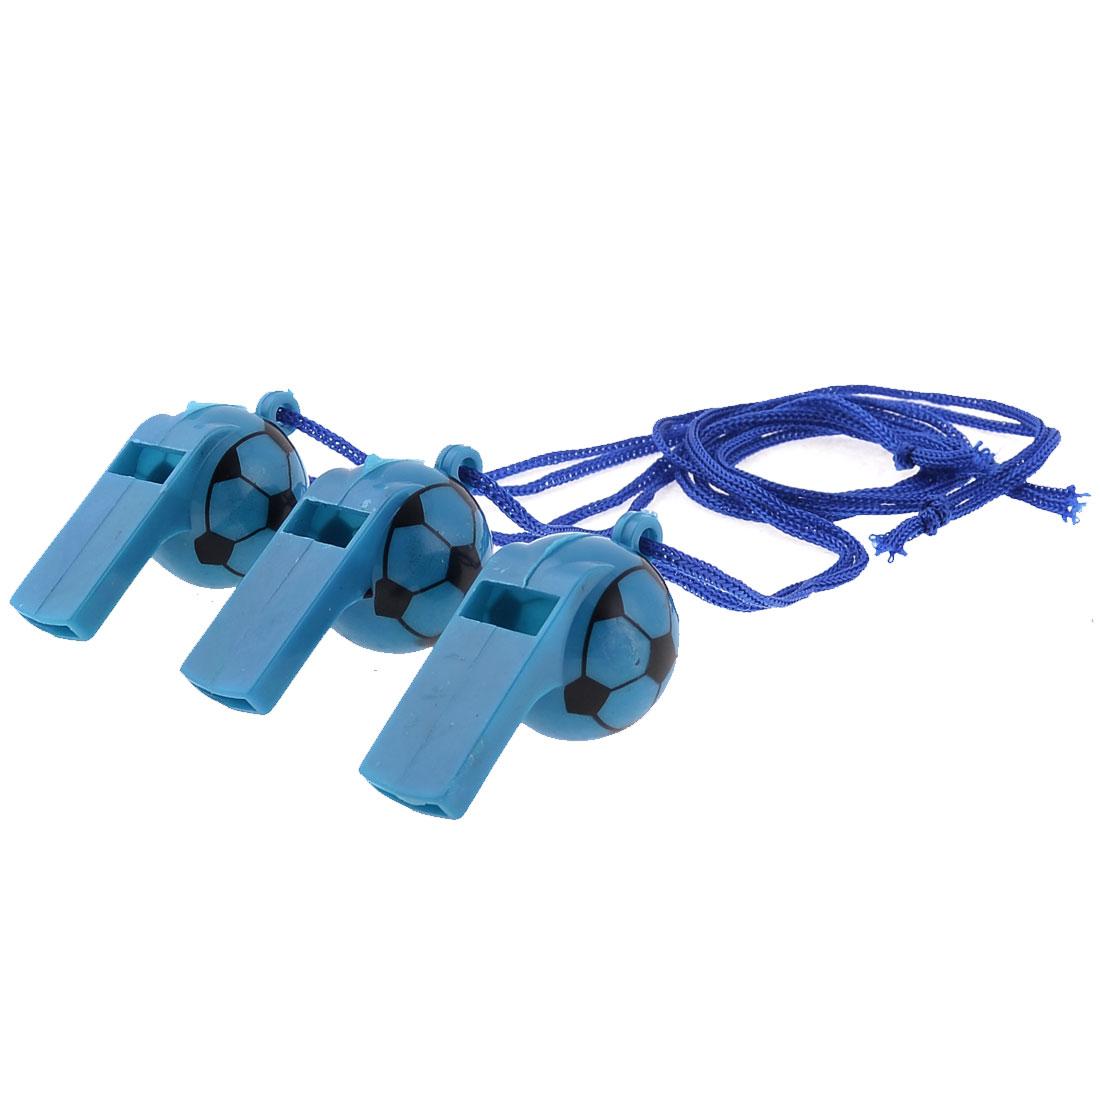 Neck String Black Football Pattern Plastic Referee Type Whistles 3 Pcs